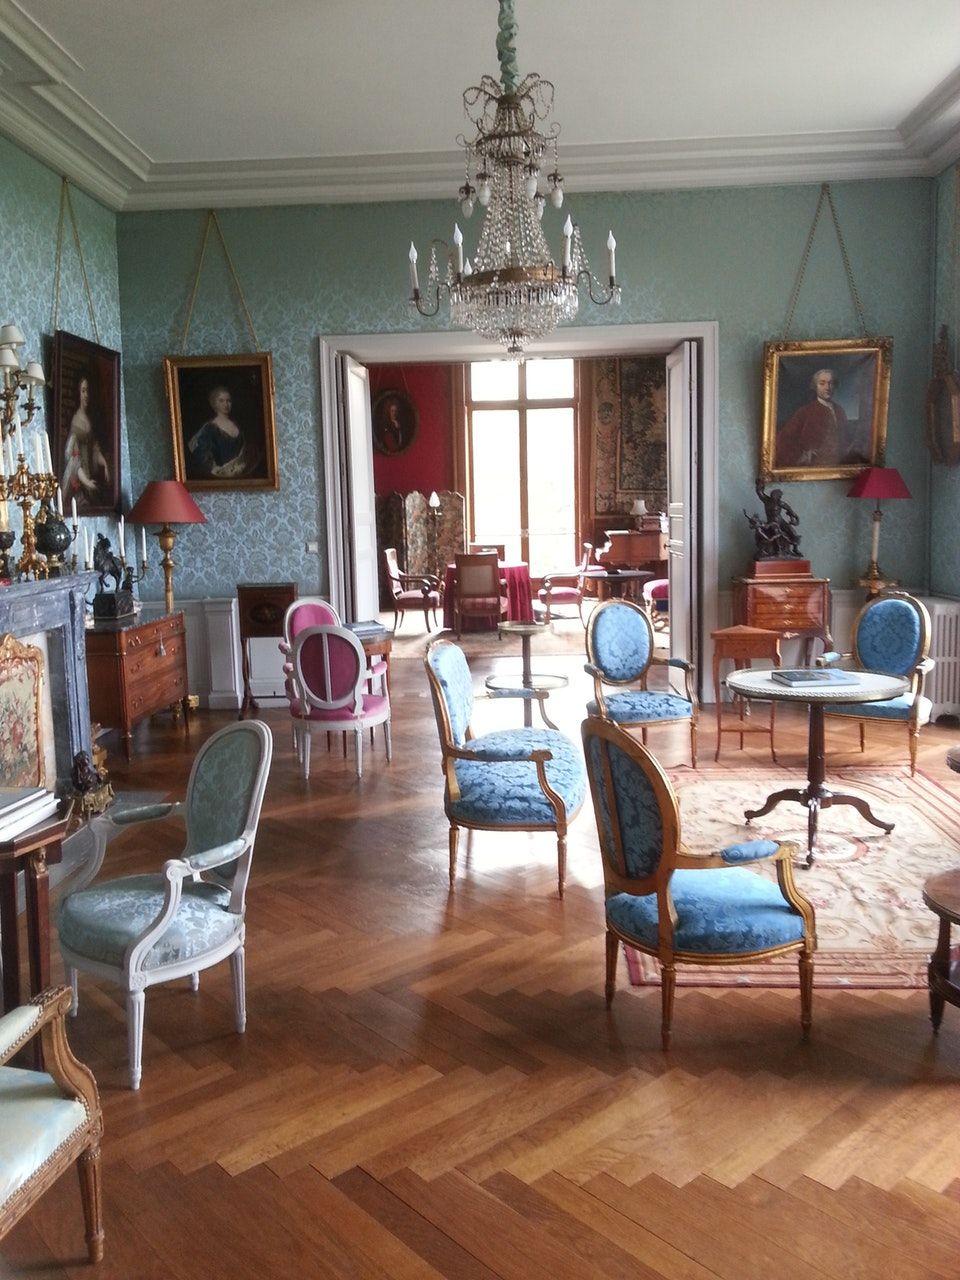 Chateau de chantore chambre d 39 h tes gite bacilly in - Chambre d hotes region parisienne ...